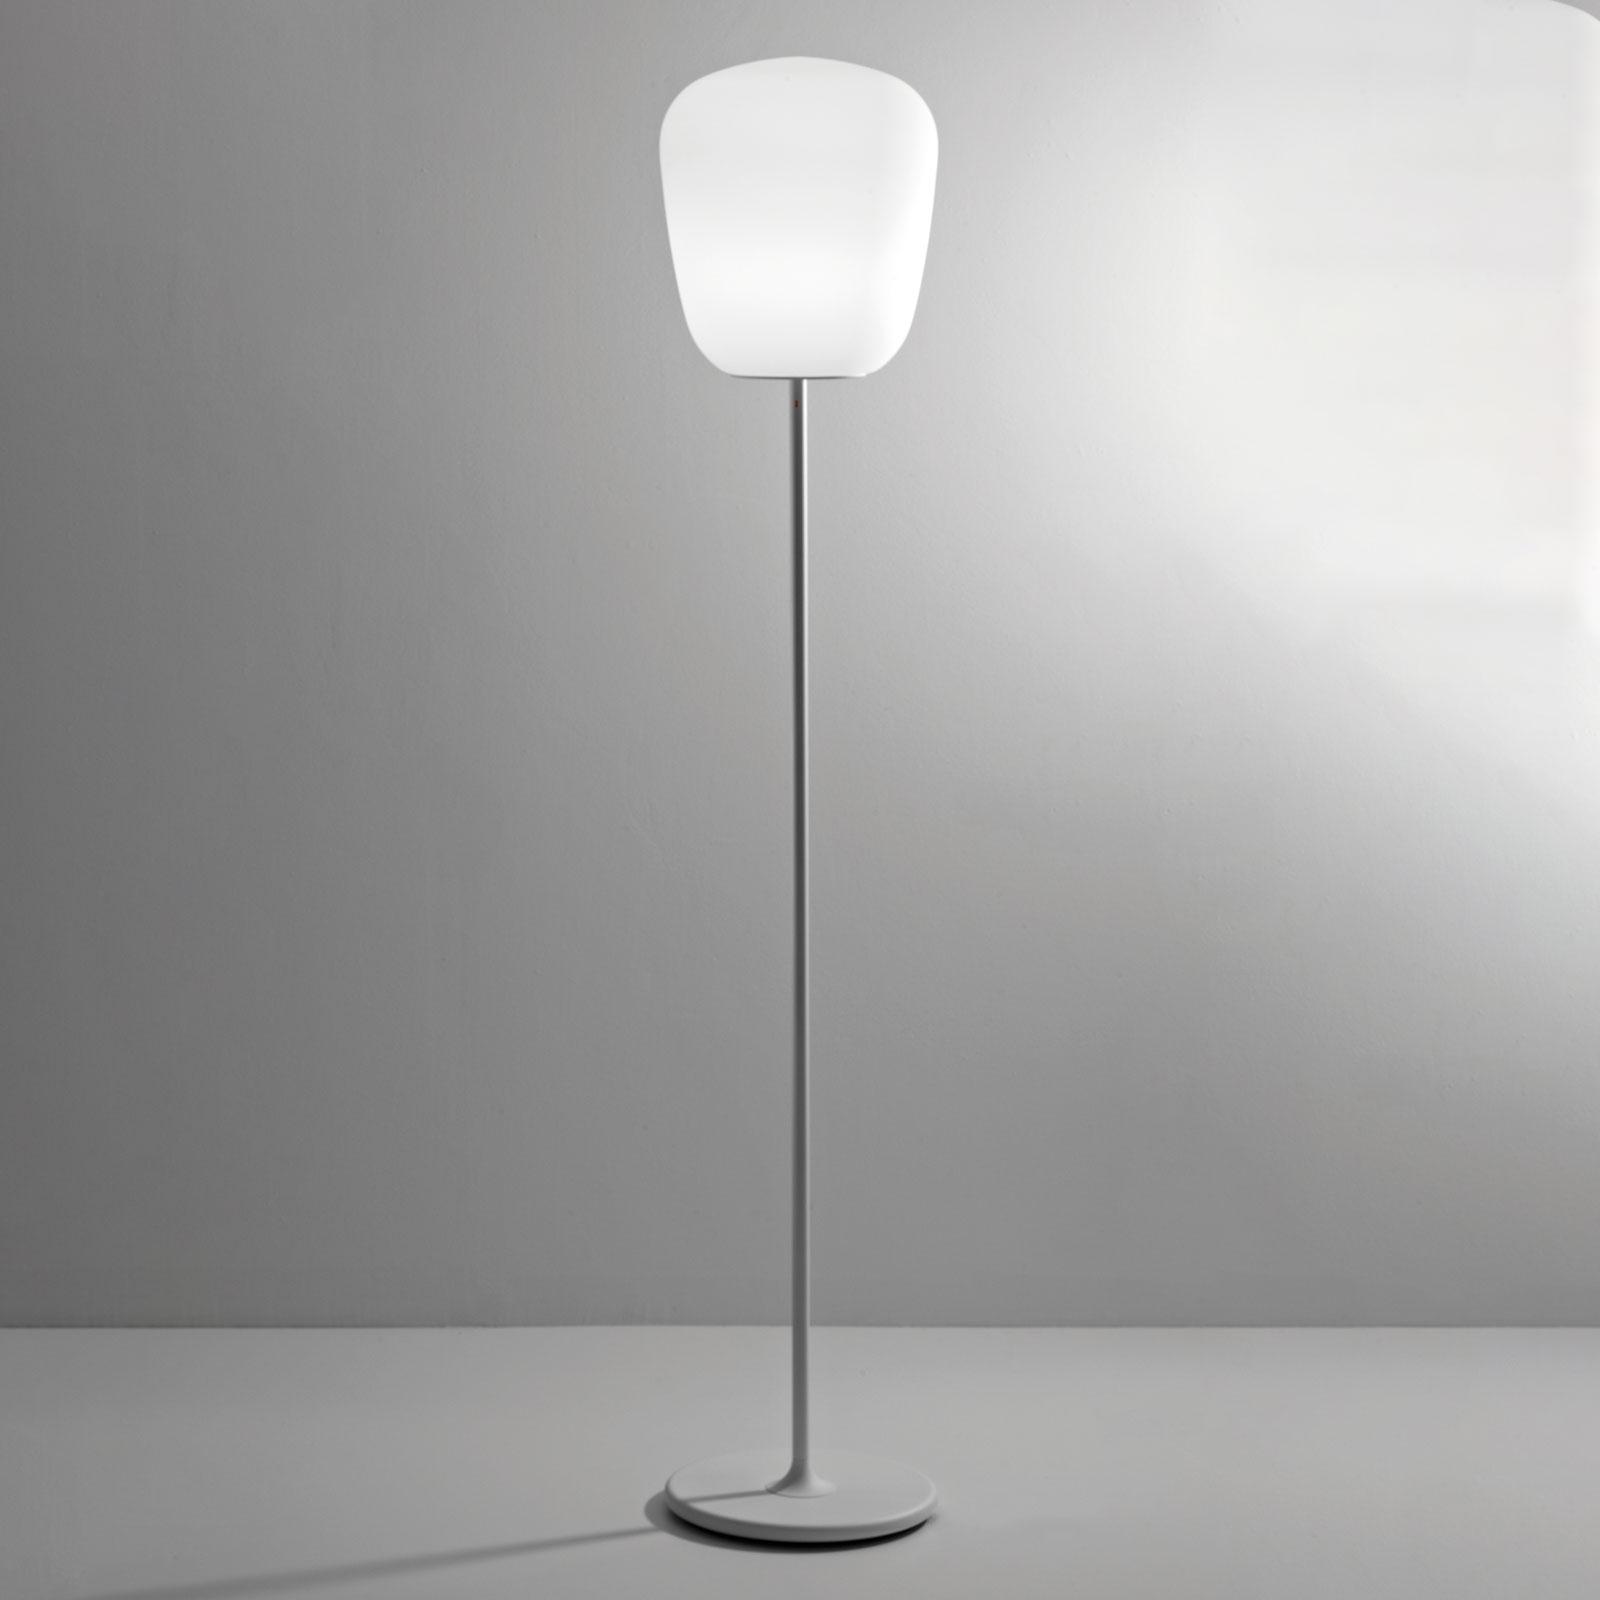 Fabbian Lumi Baka szklana lampa stojąca, Ø 33 cm